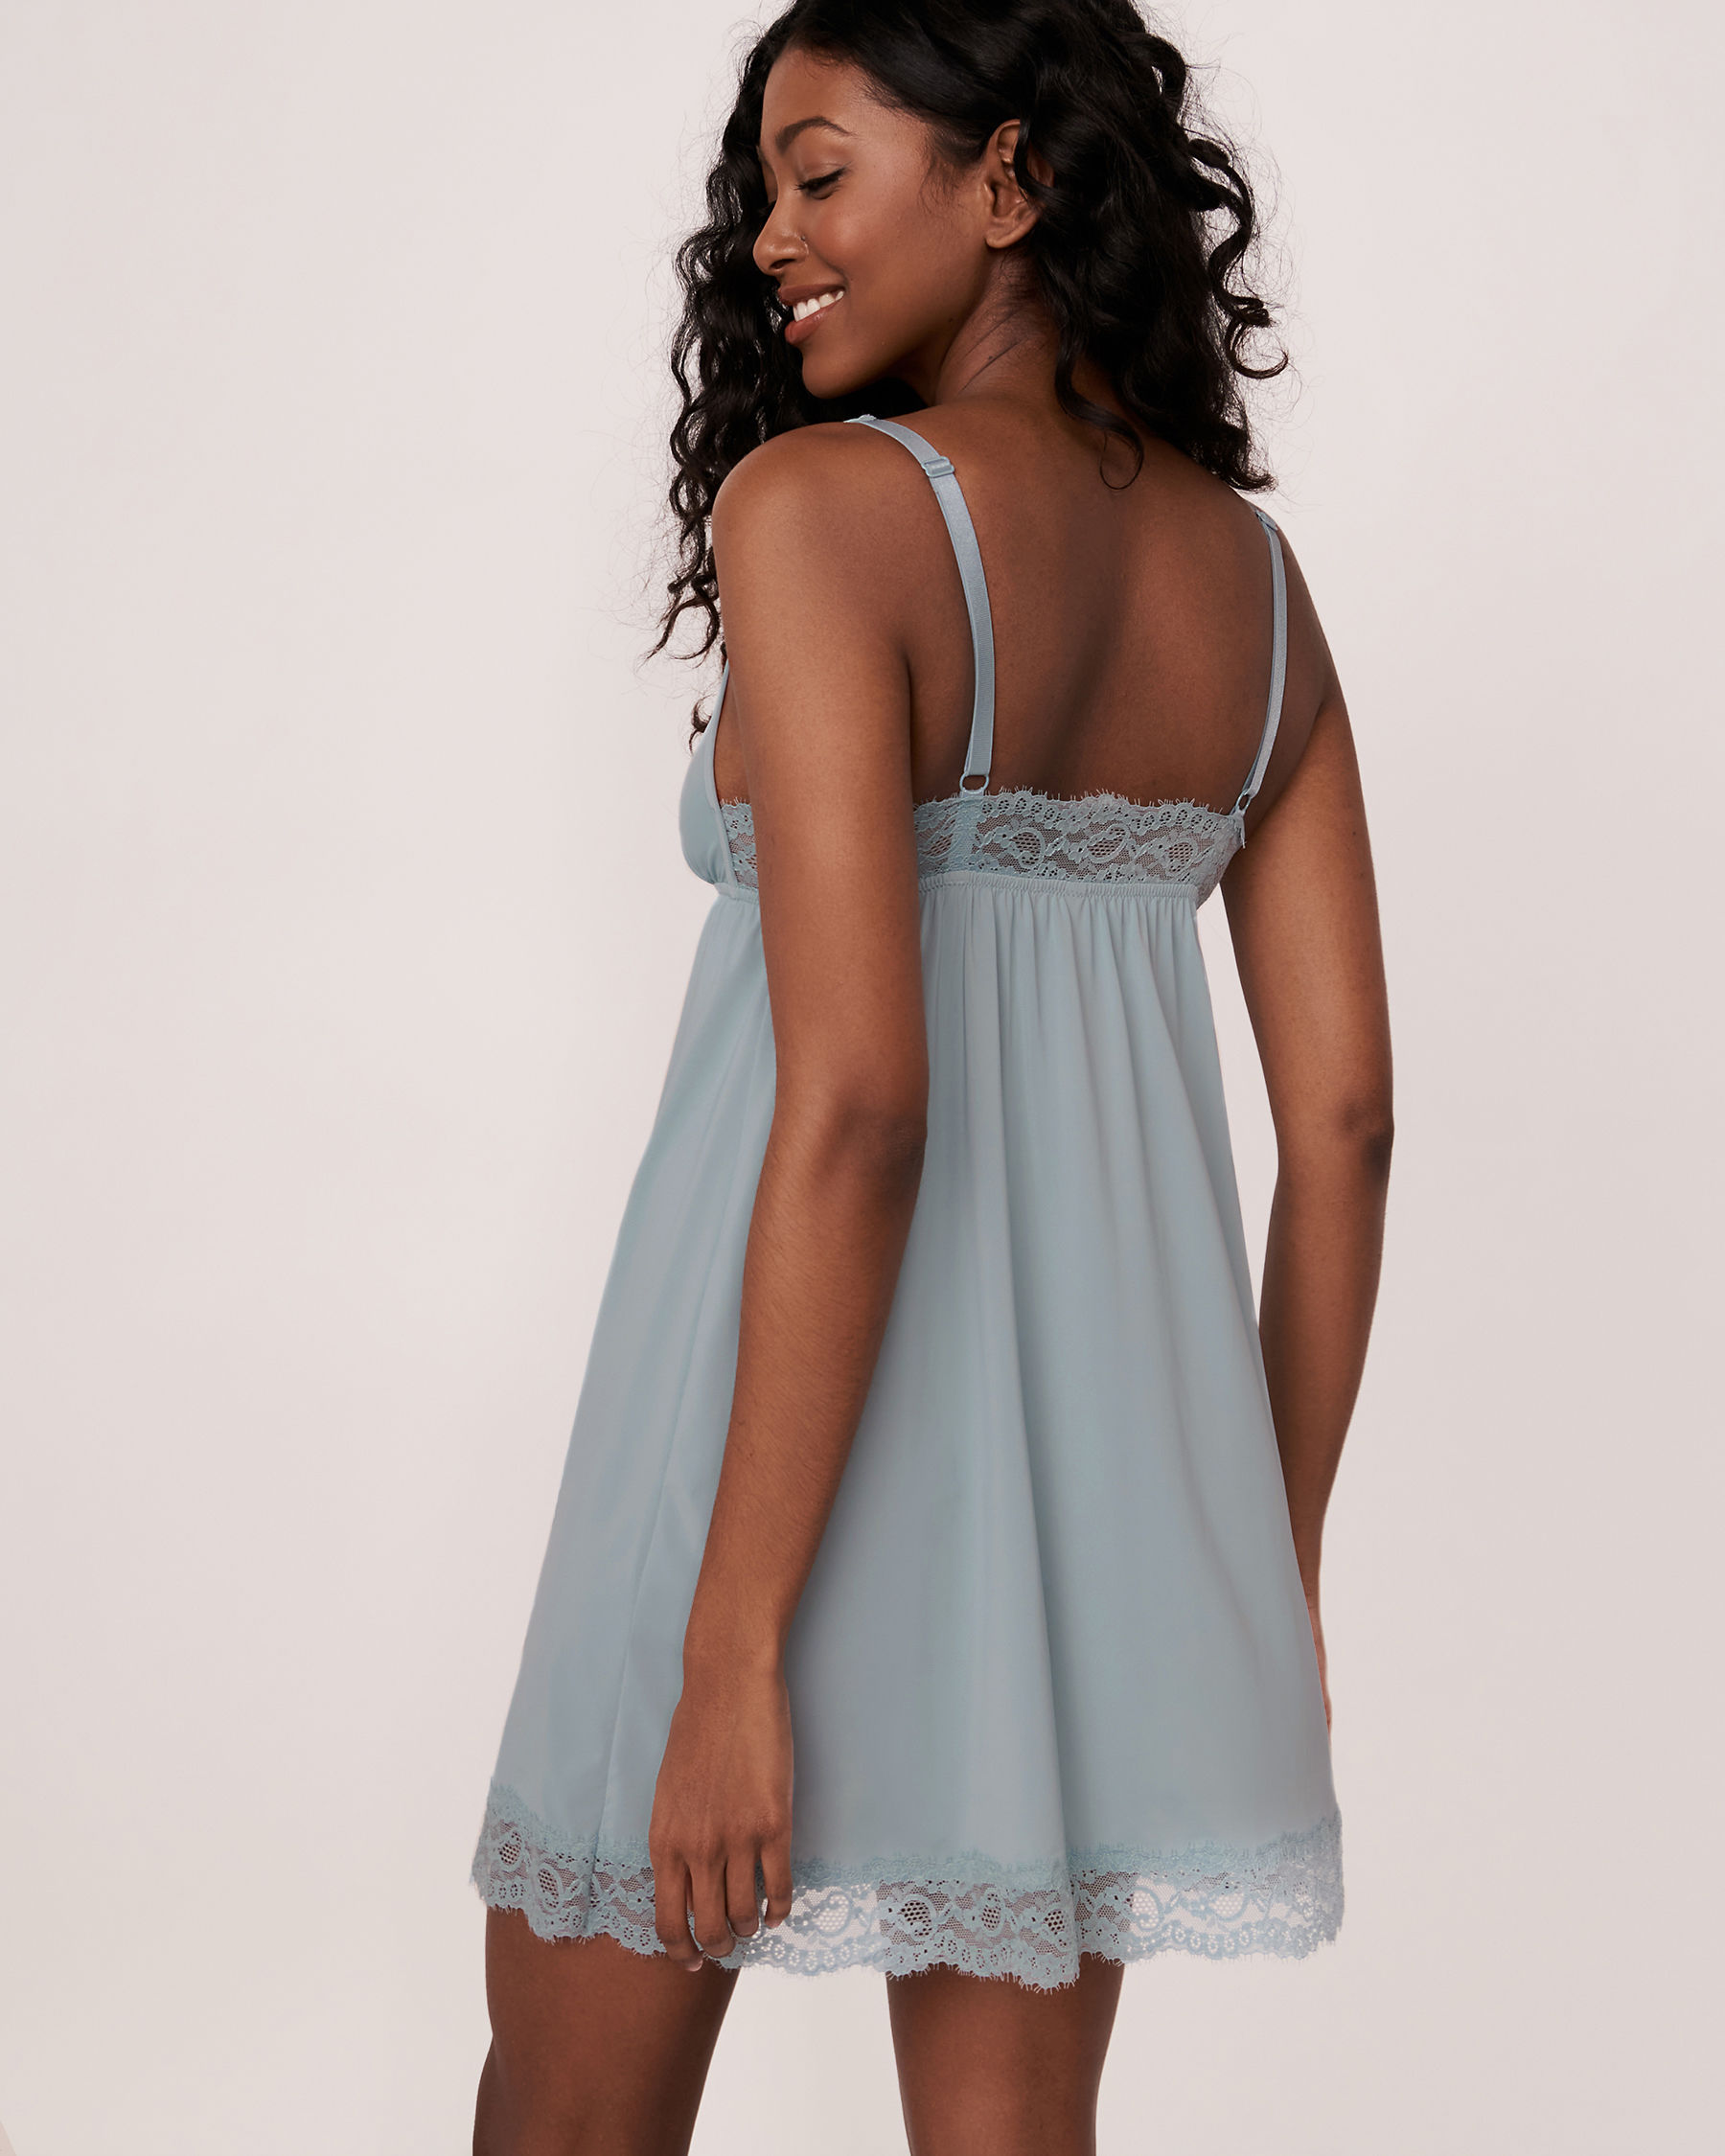 LA VIE EN ROSE Lace Trim Nightie Blue grey 60500004 - View2